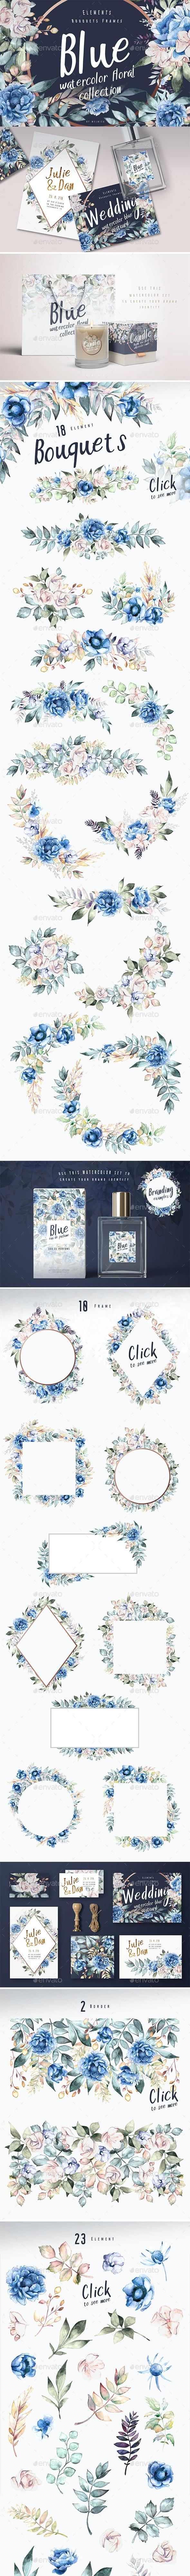 Blue - Watercolor Dark Floral Collection